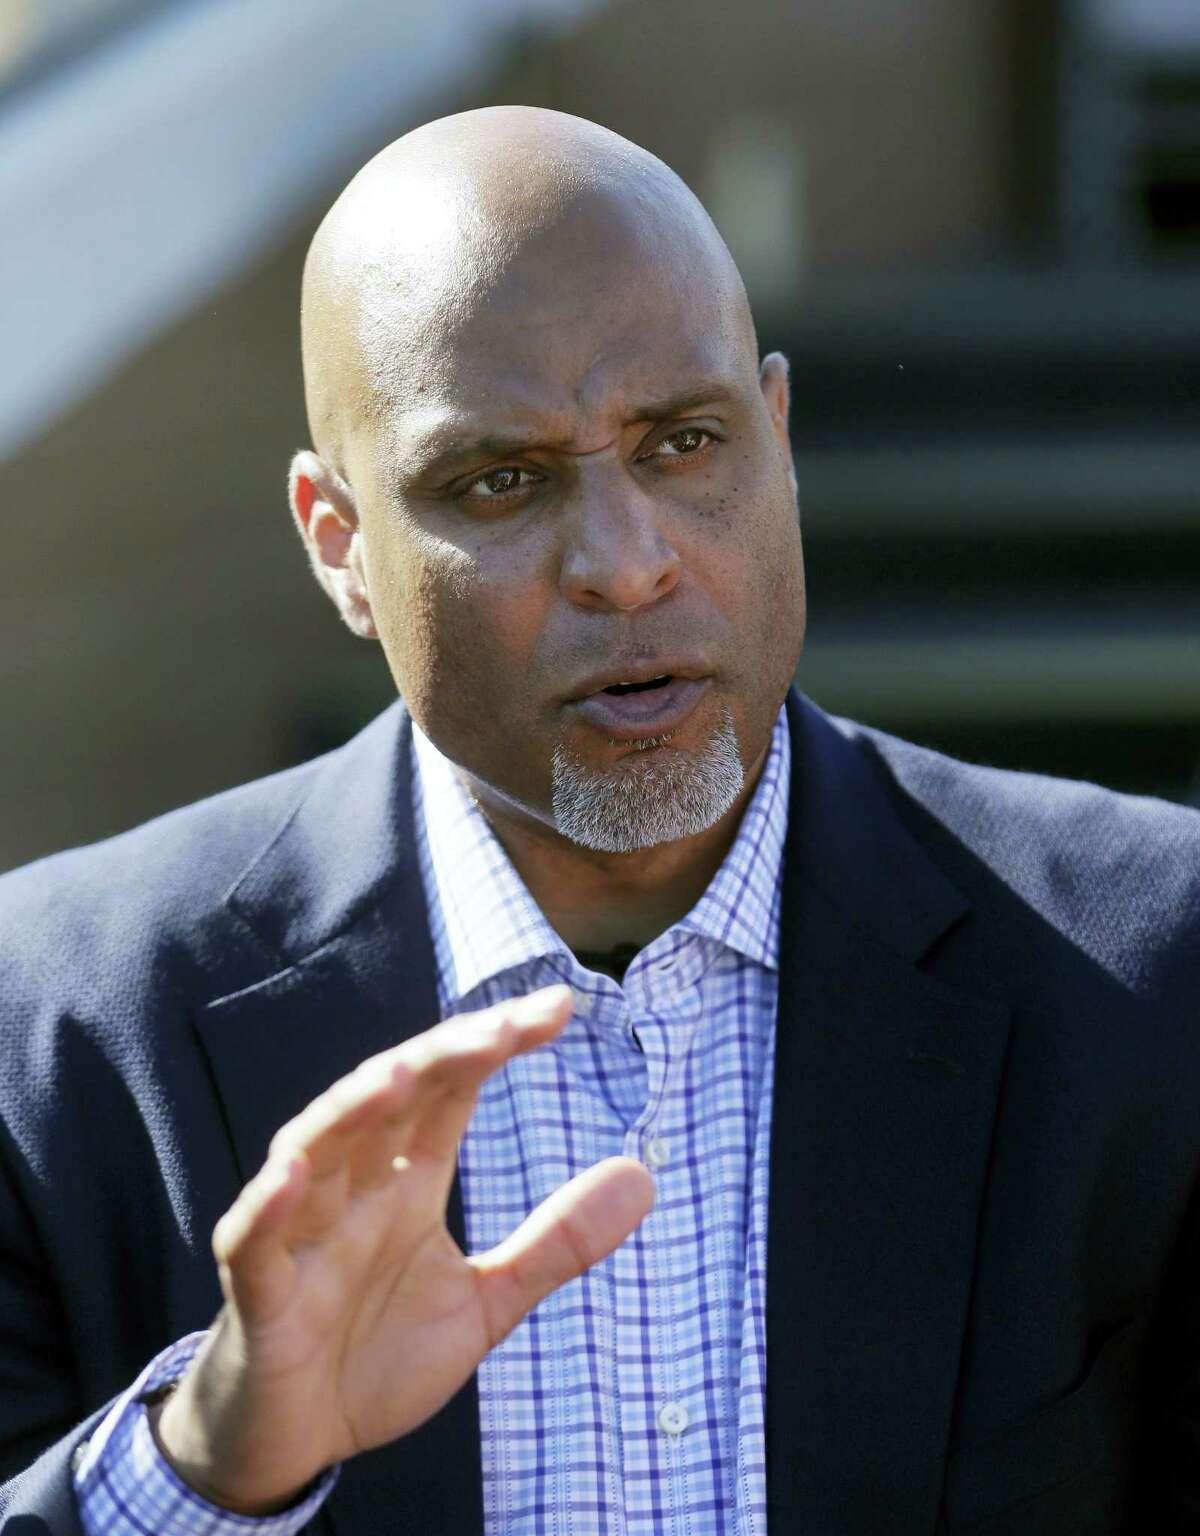 Major League Baseball Players Association executive and former Detroit Tigers first baseman Tony Clark.